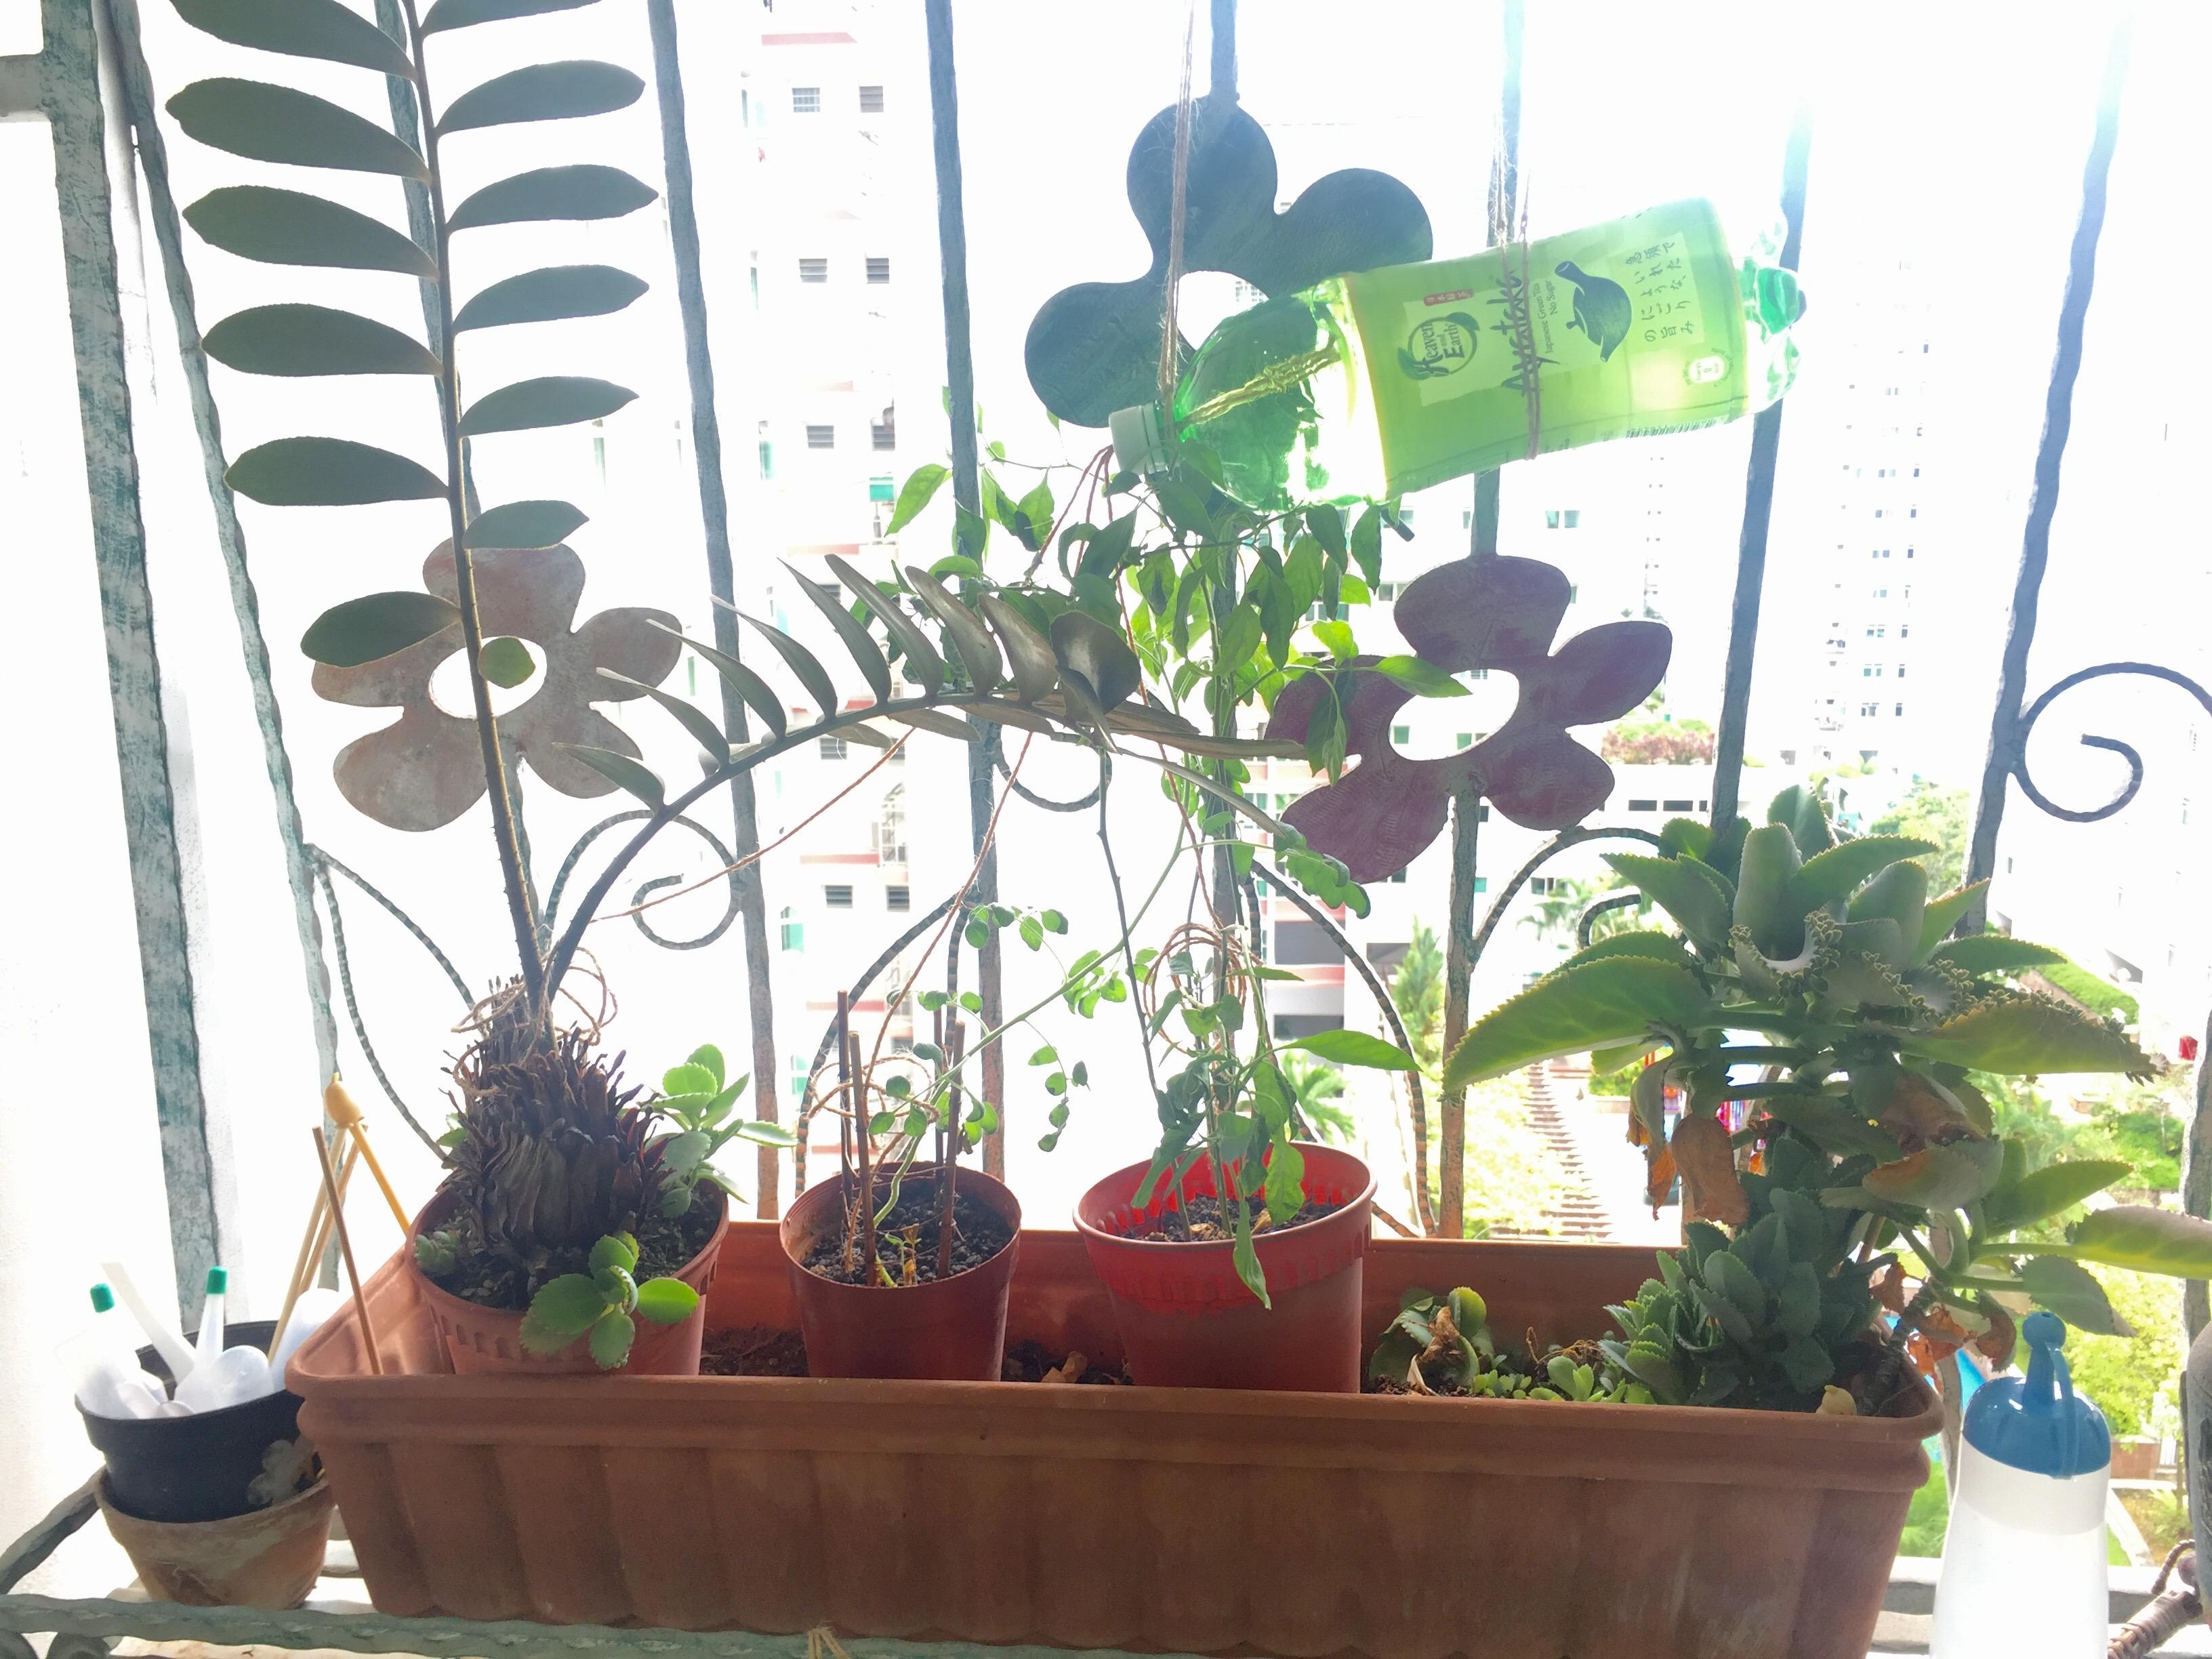 DIY Drip Feed for Plants